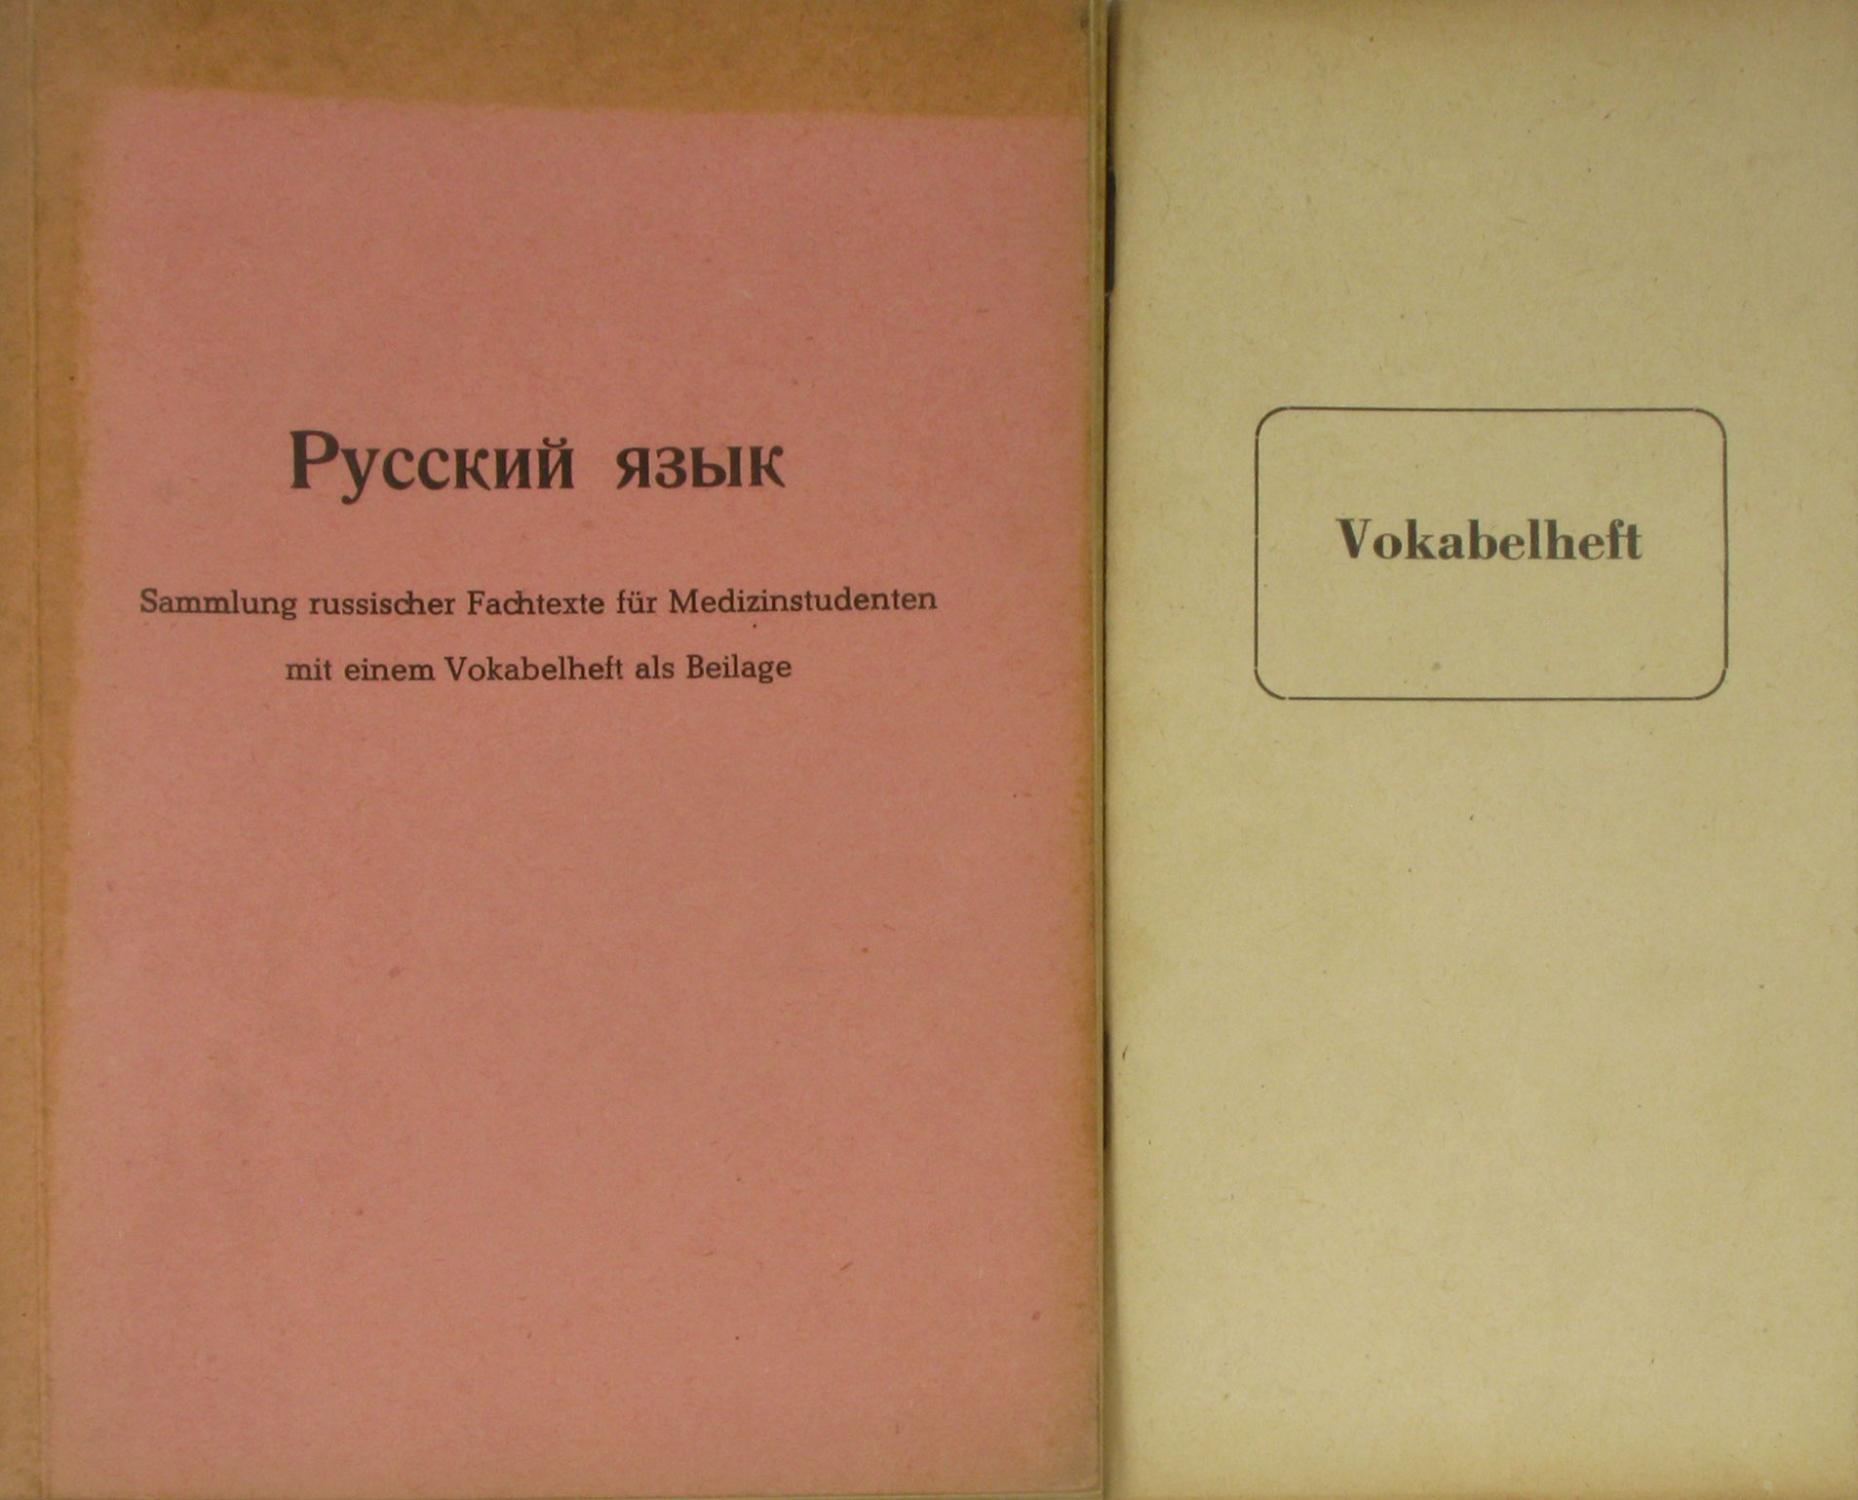 Schule & Ausbildung Aus Dem Ausland Importiert Deutsches Lesebuch Autorenkollektiv: Bücher